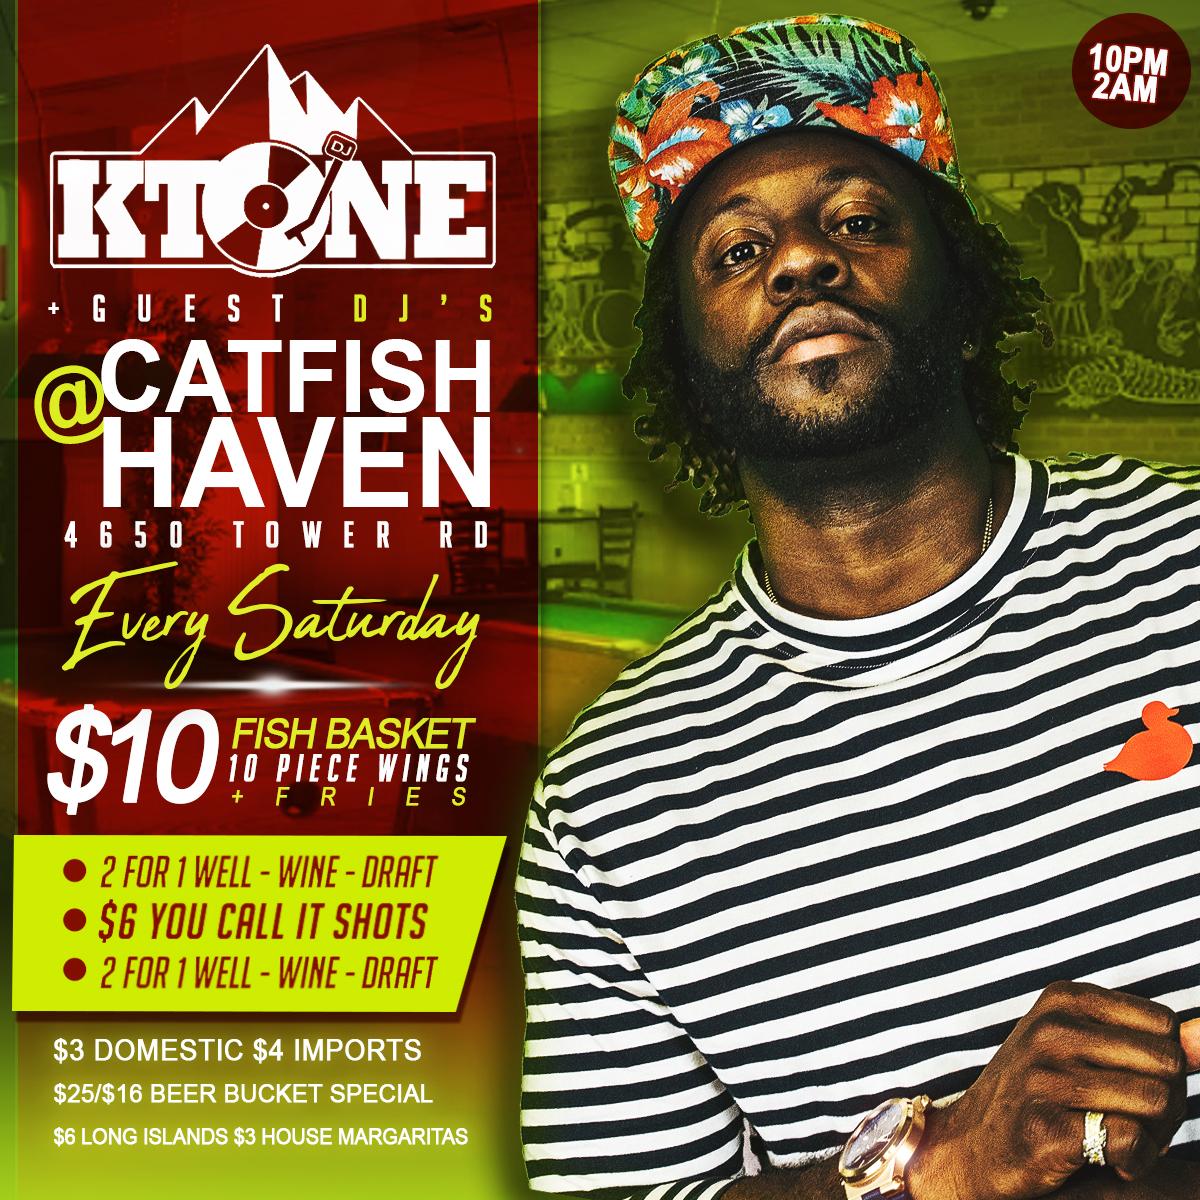 Catch DJ Ktone Every Saturday at the Catfish Haven in Denver Colorado